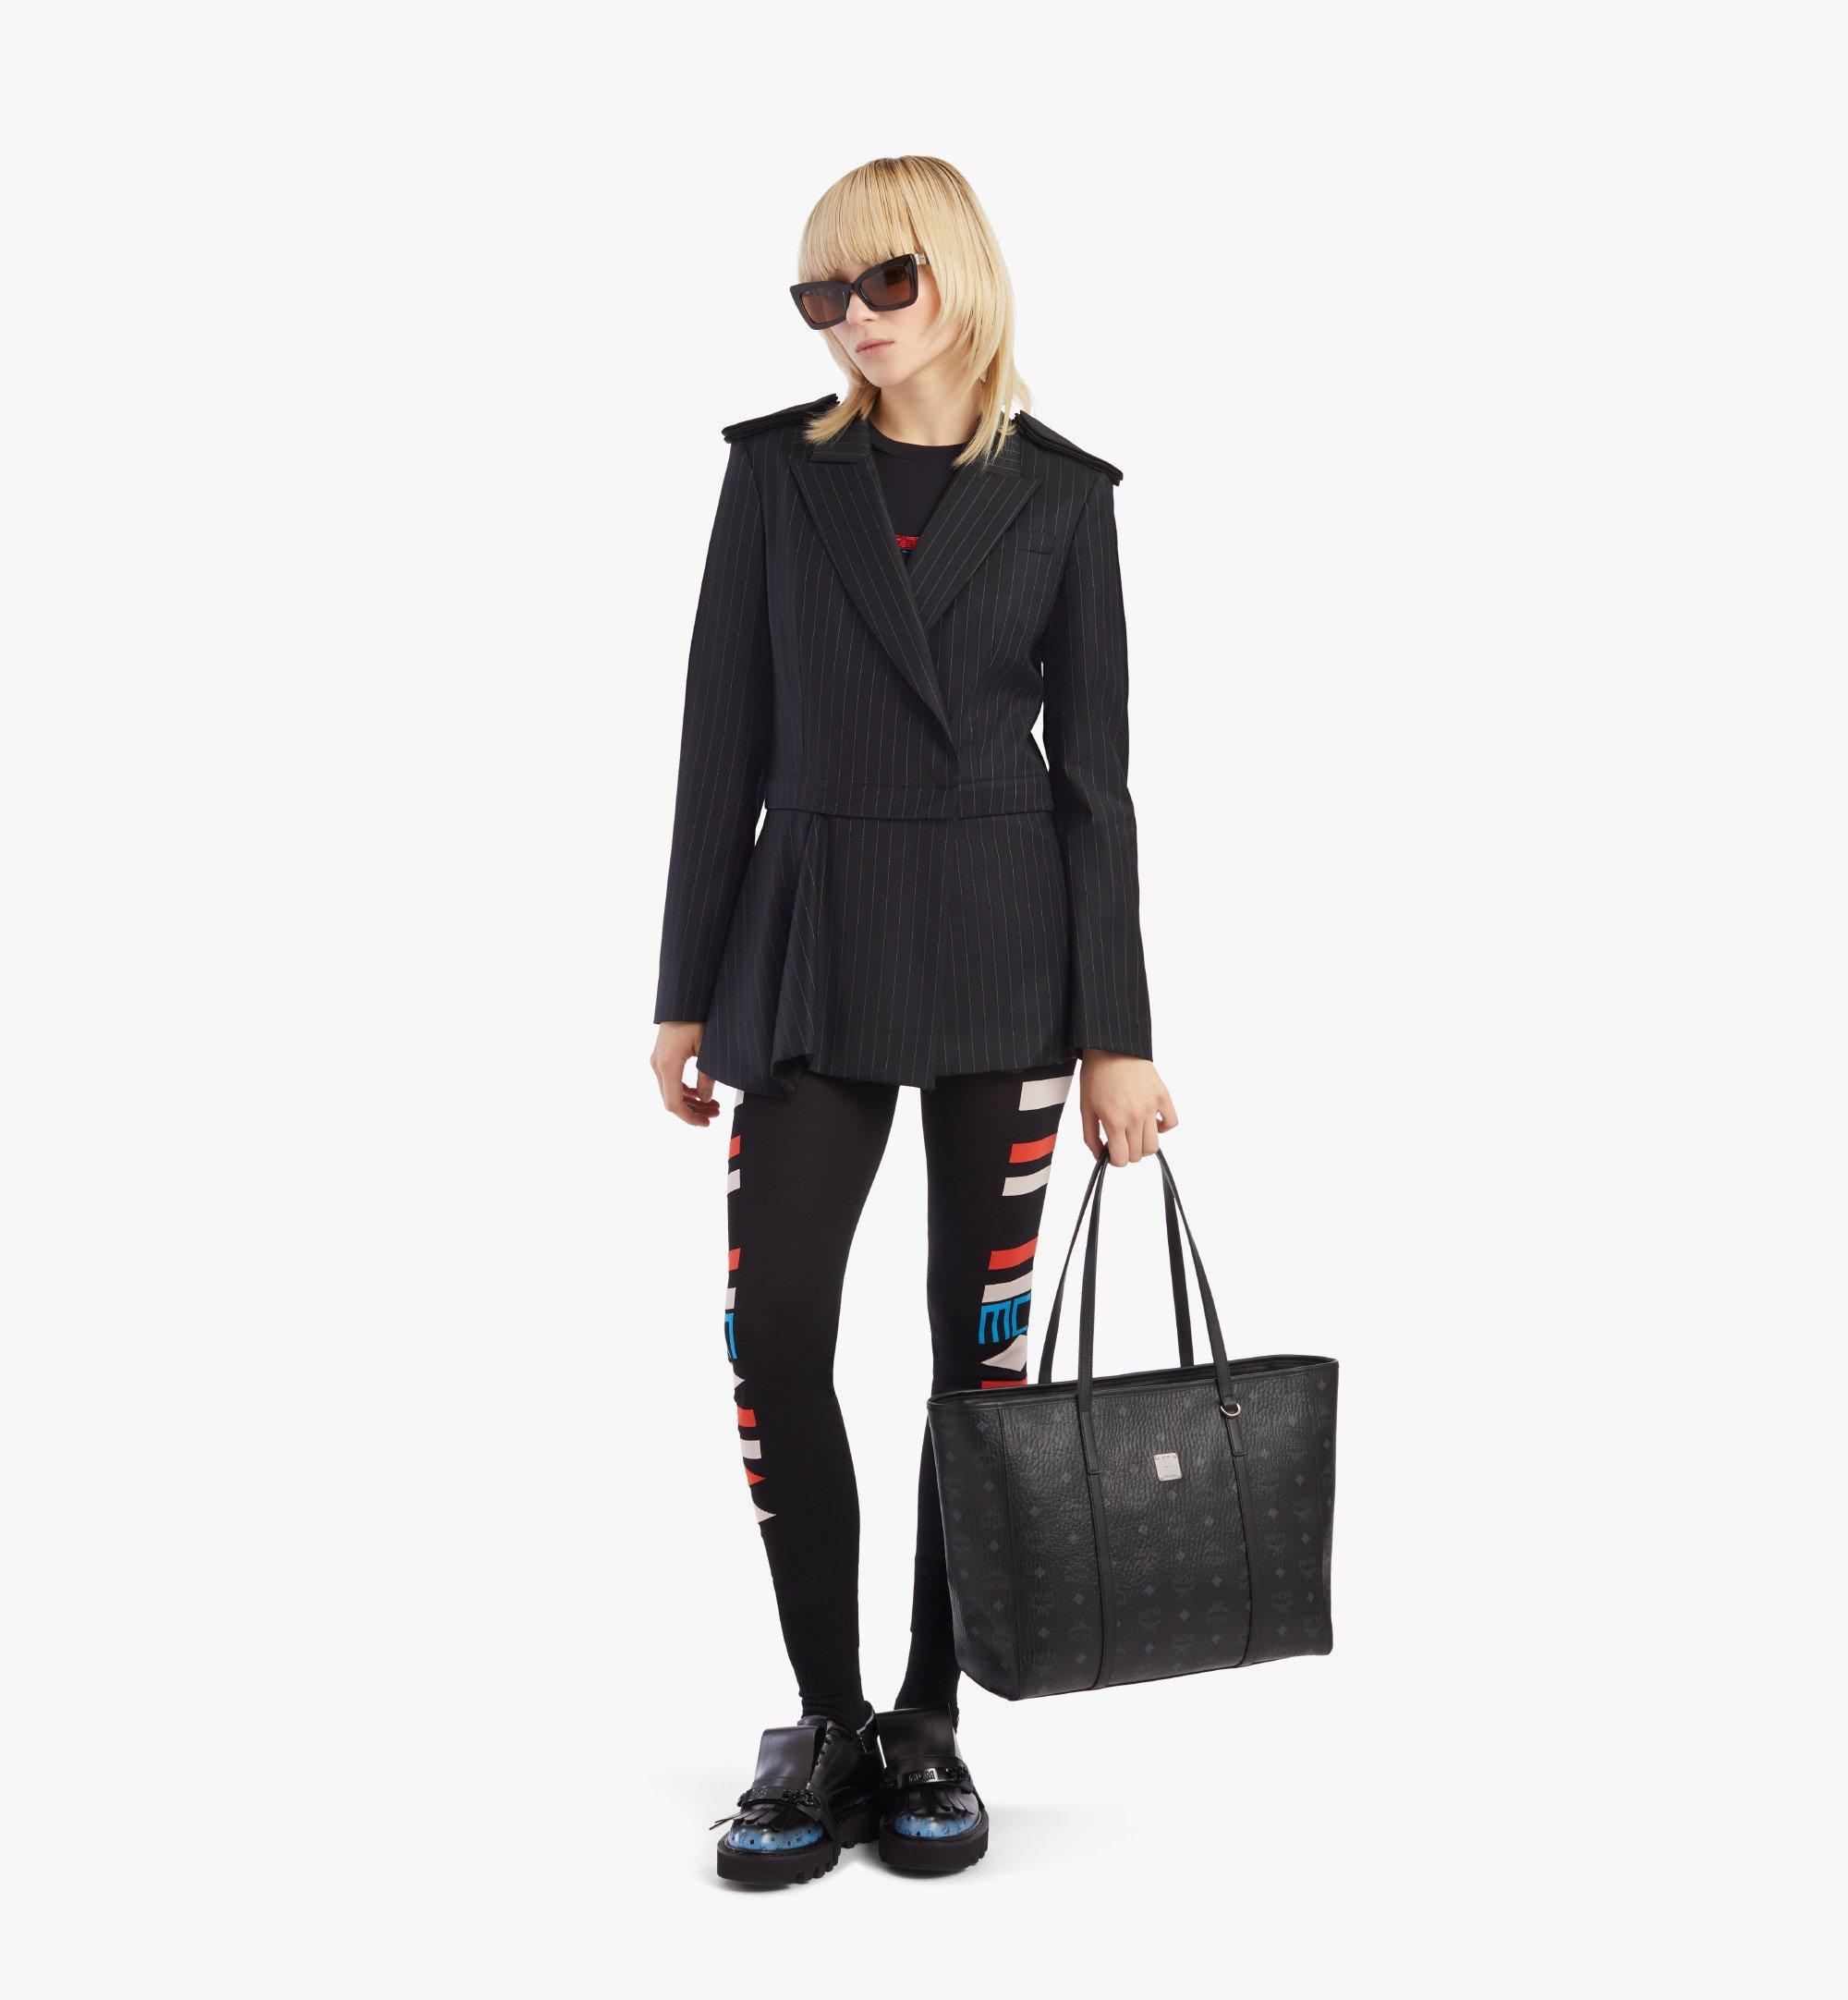 MCM Toni E/W Shopper in Visetos Black MWPAATN01BK001 Alternate View 3